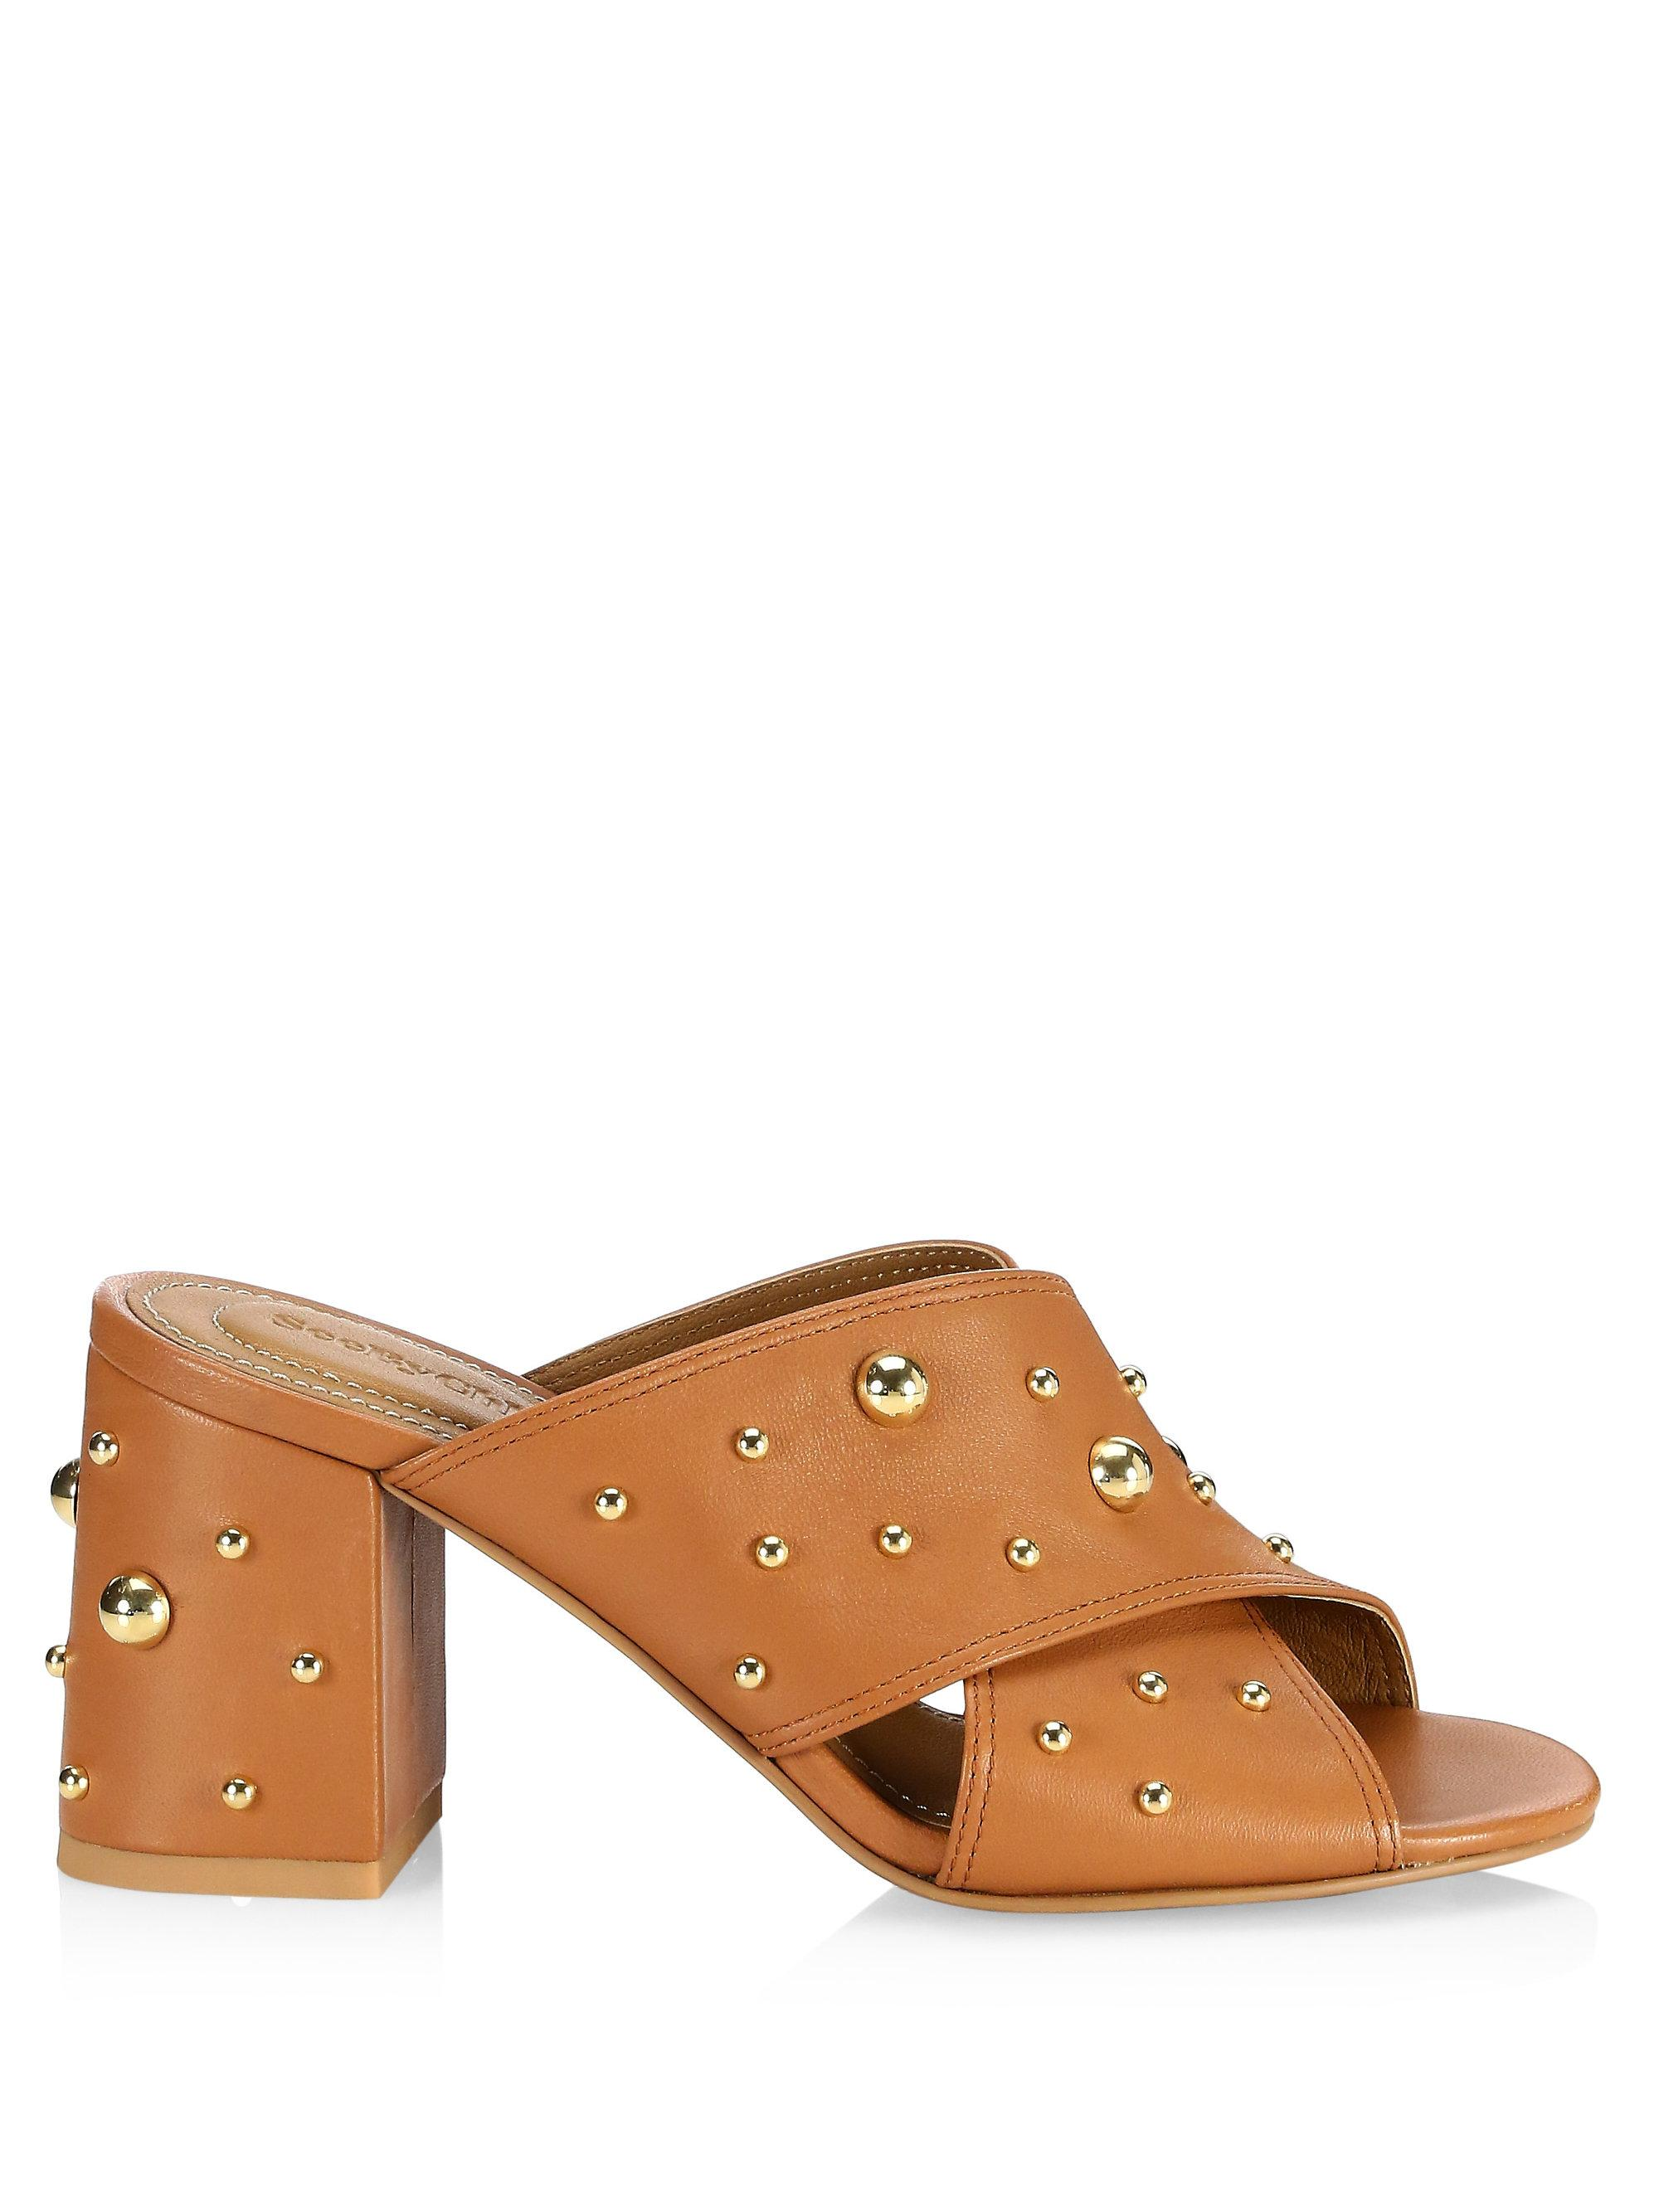 Chloé Abby Caramel Crisscross Sandals r1nTob8Q7